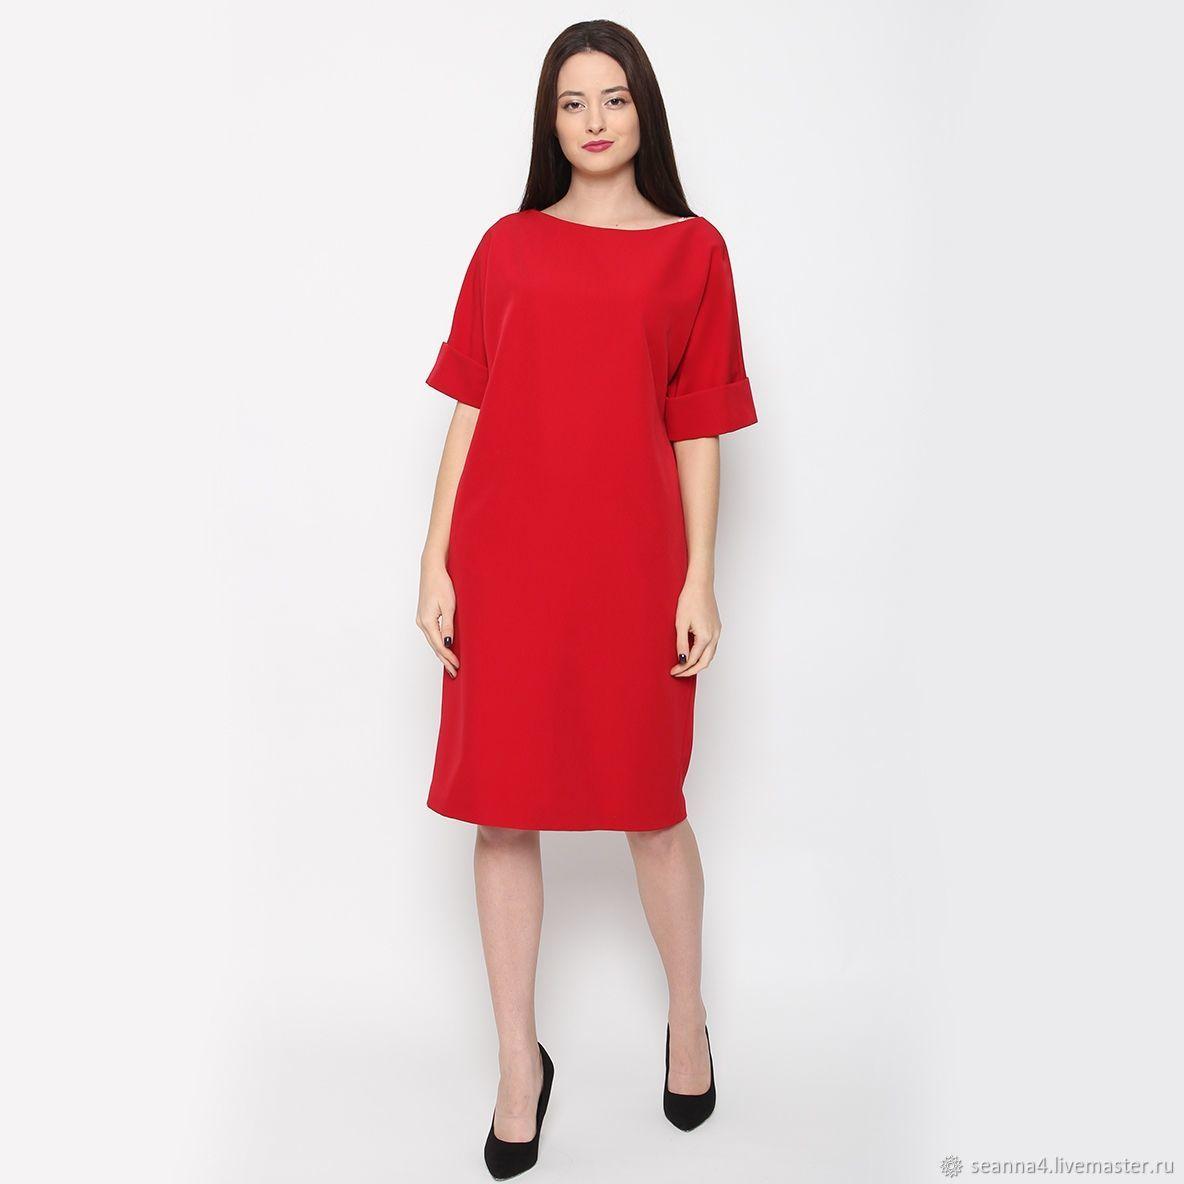 Платье-баллон ярко-красное, Платья, Воронеж,  Фото №1